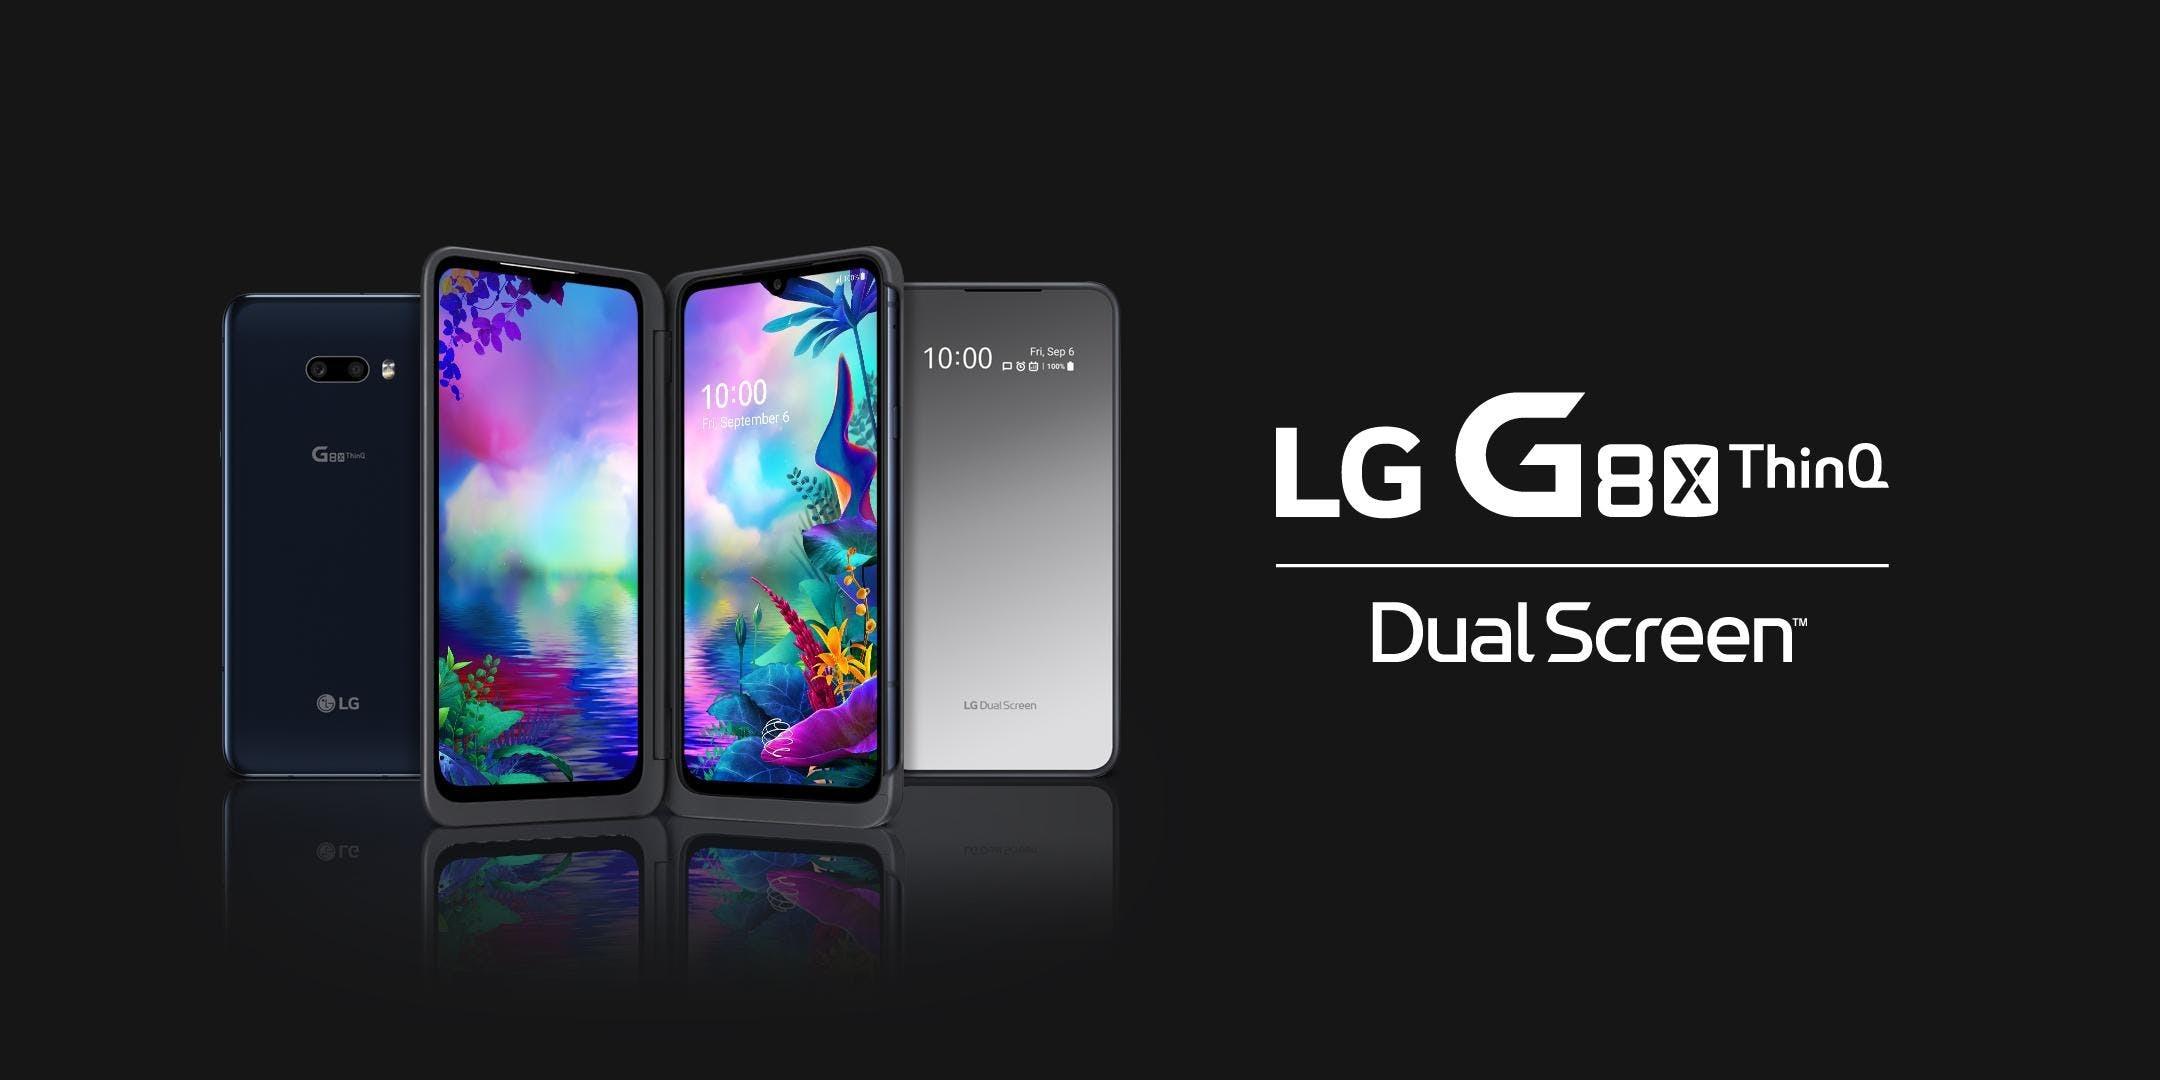 lg g8x thinq preview